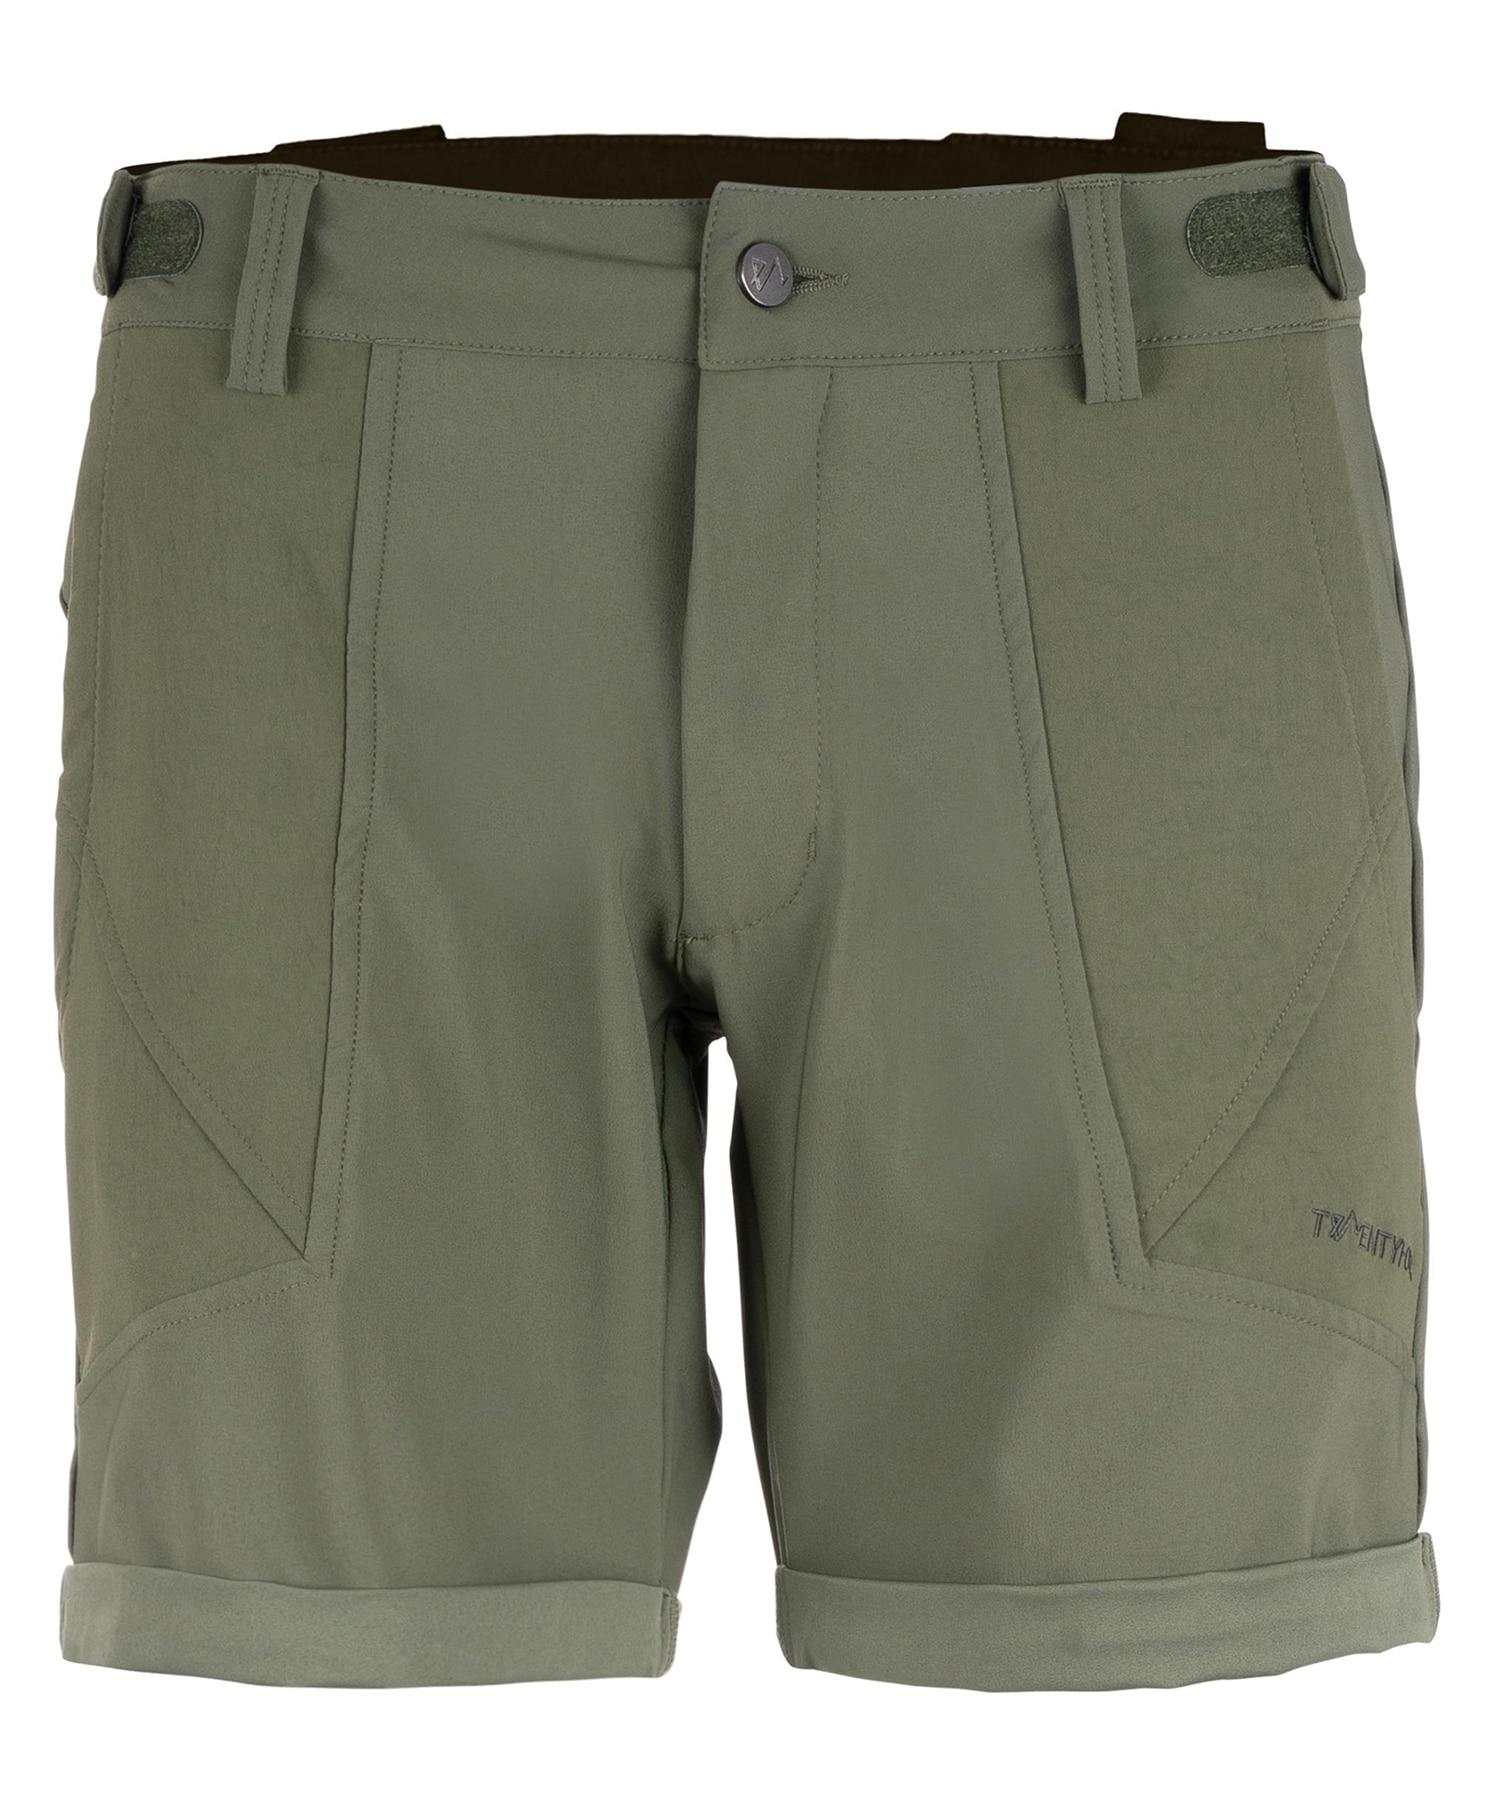 Twentyfour LS Shorts